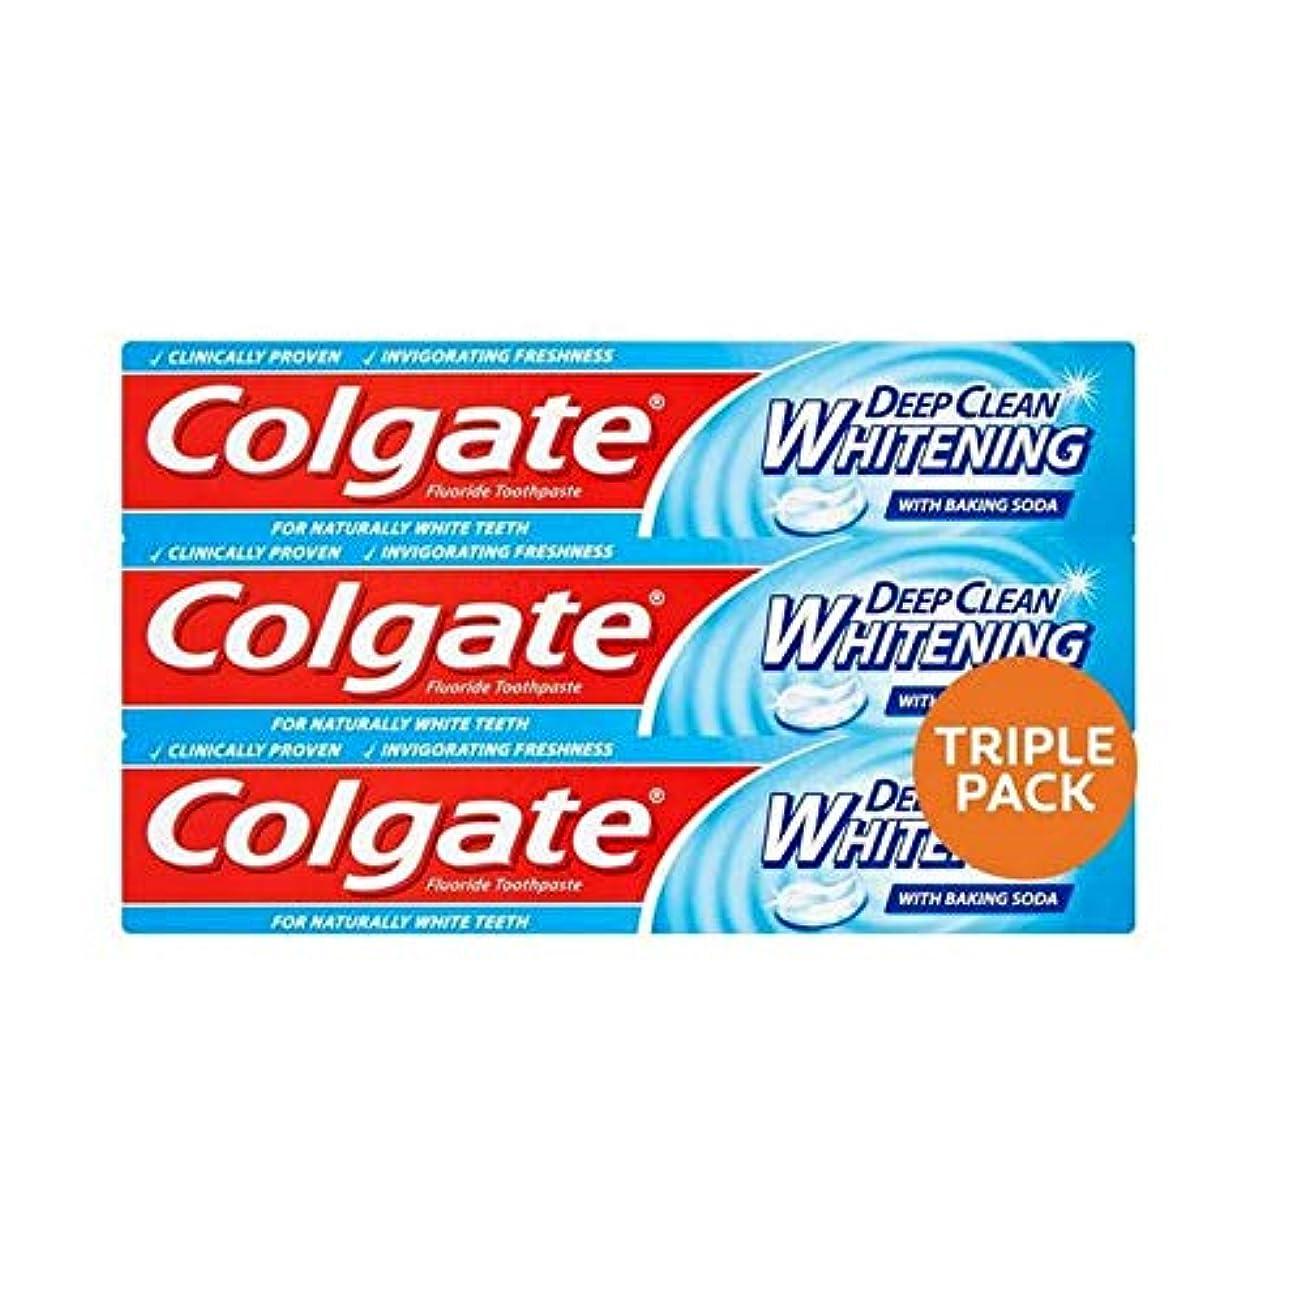 [Colgate ] コルゲート深いクリーンホワイトニング歯磨きトリプルパック3×75ミリリットル - Colgate Deep Clean Whitening Toothpaste Triple Pack 3 x 75ml...